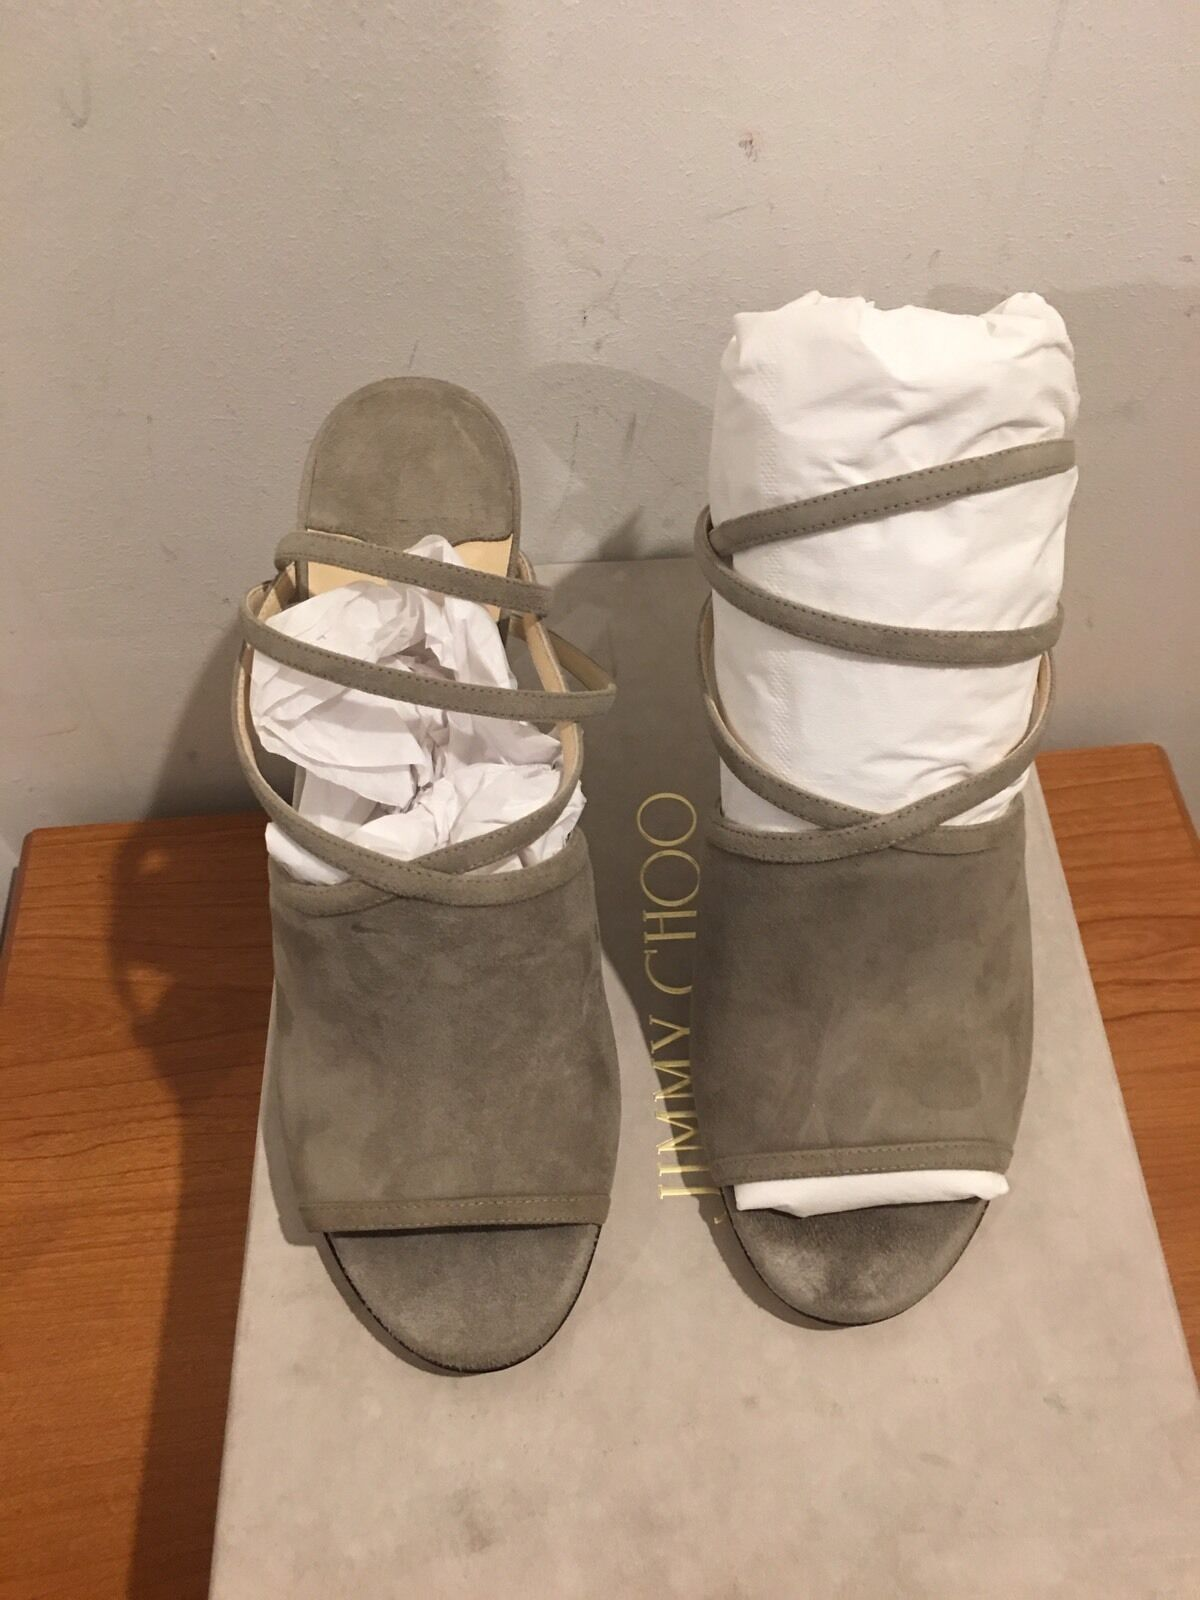 JIMMY CHOO CHOO CHOO Suede Flora Heels Sandals schuhe UK 4 EU 37 3f612b